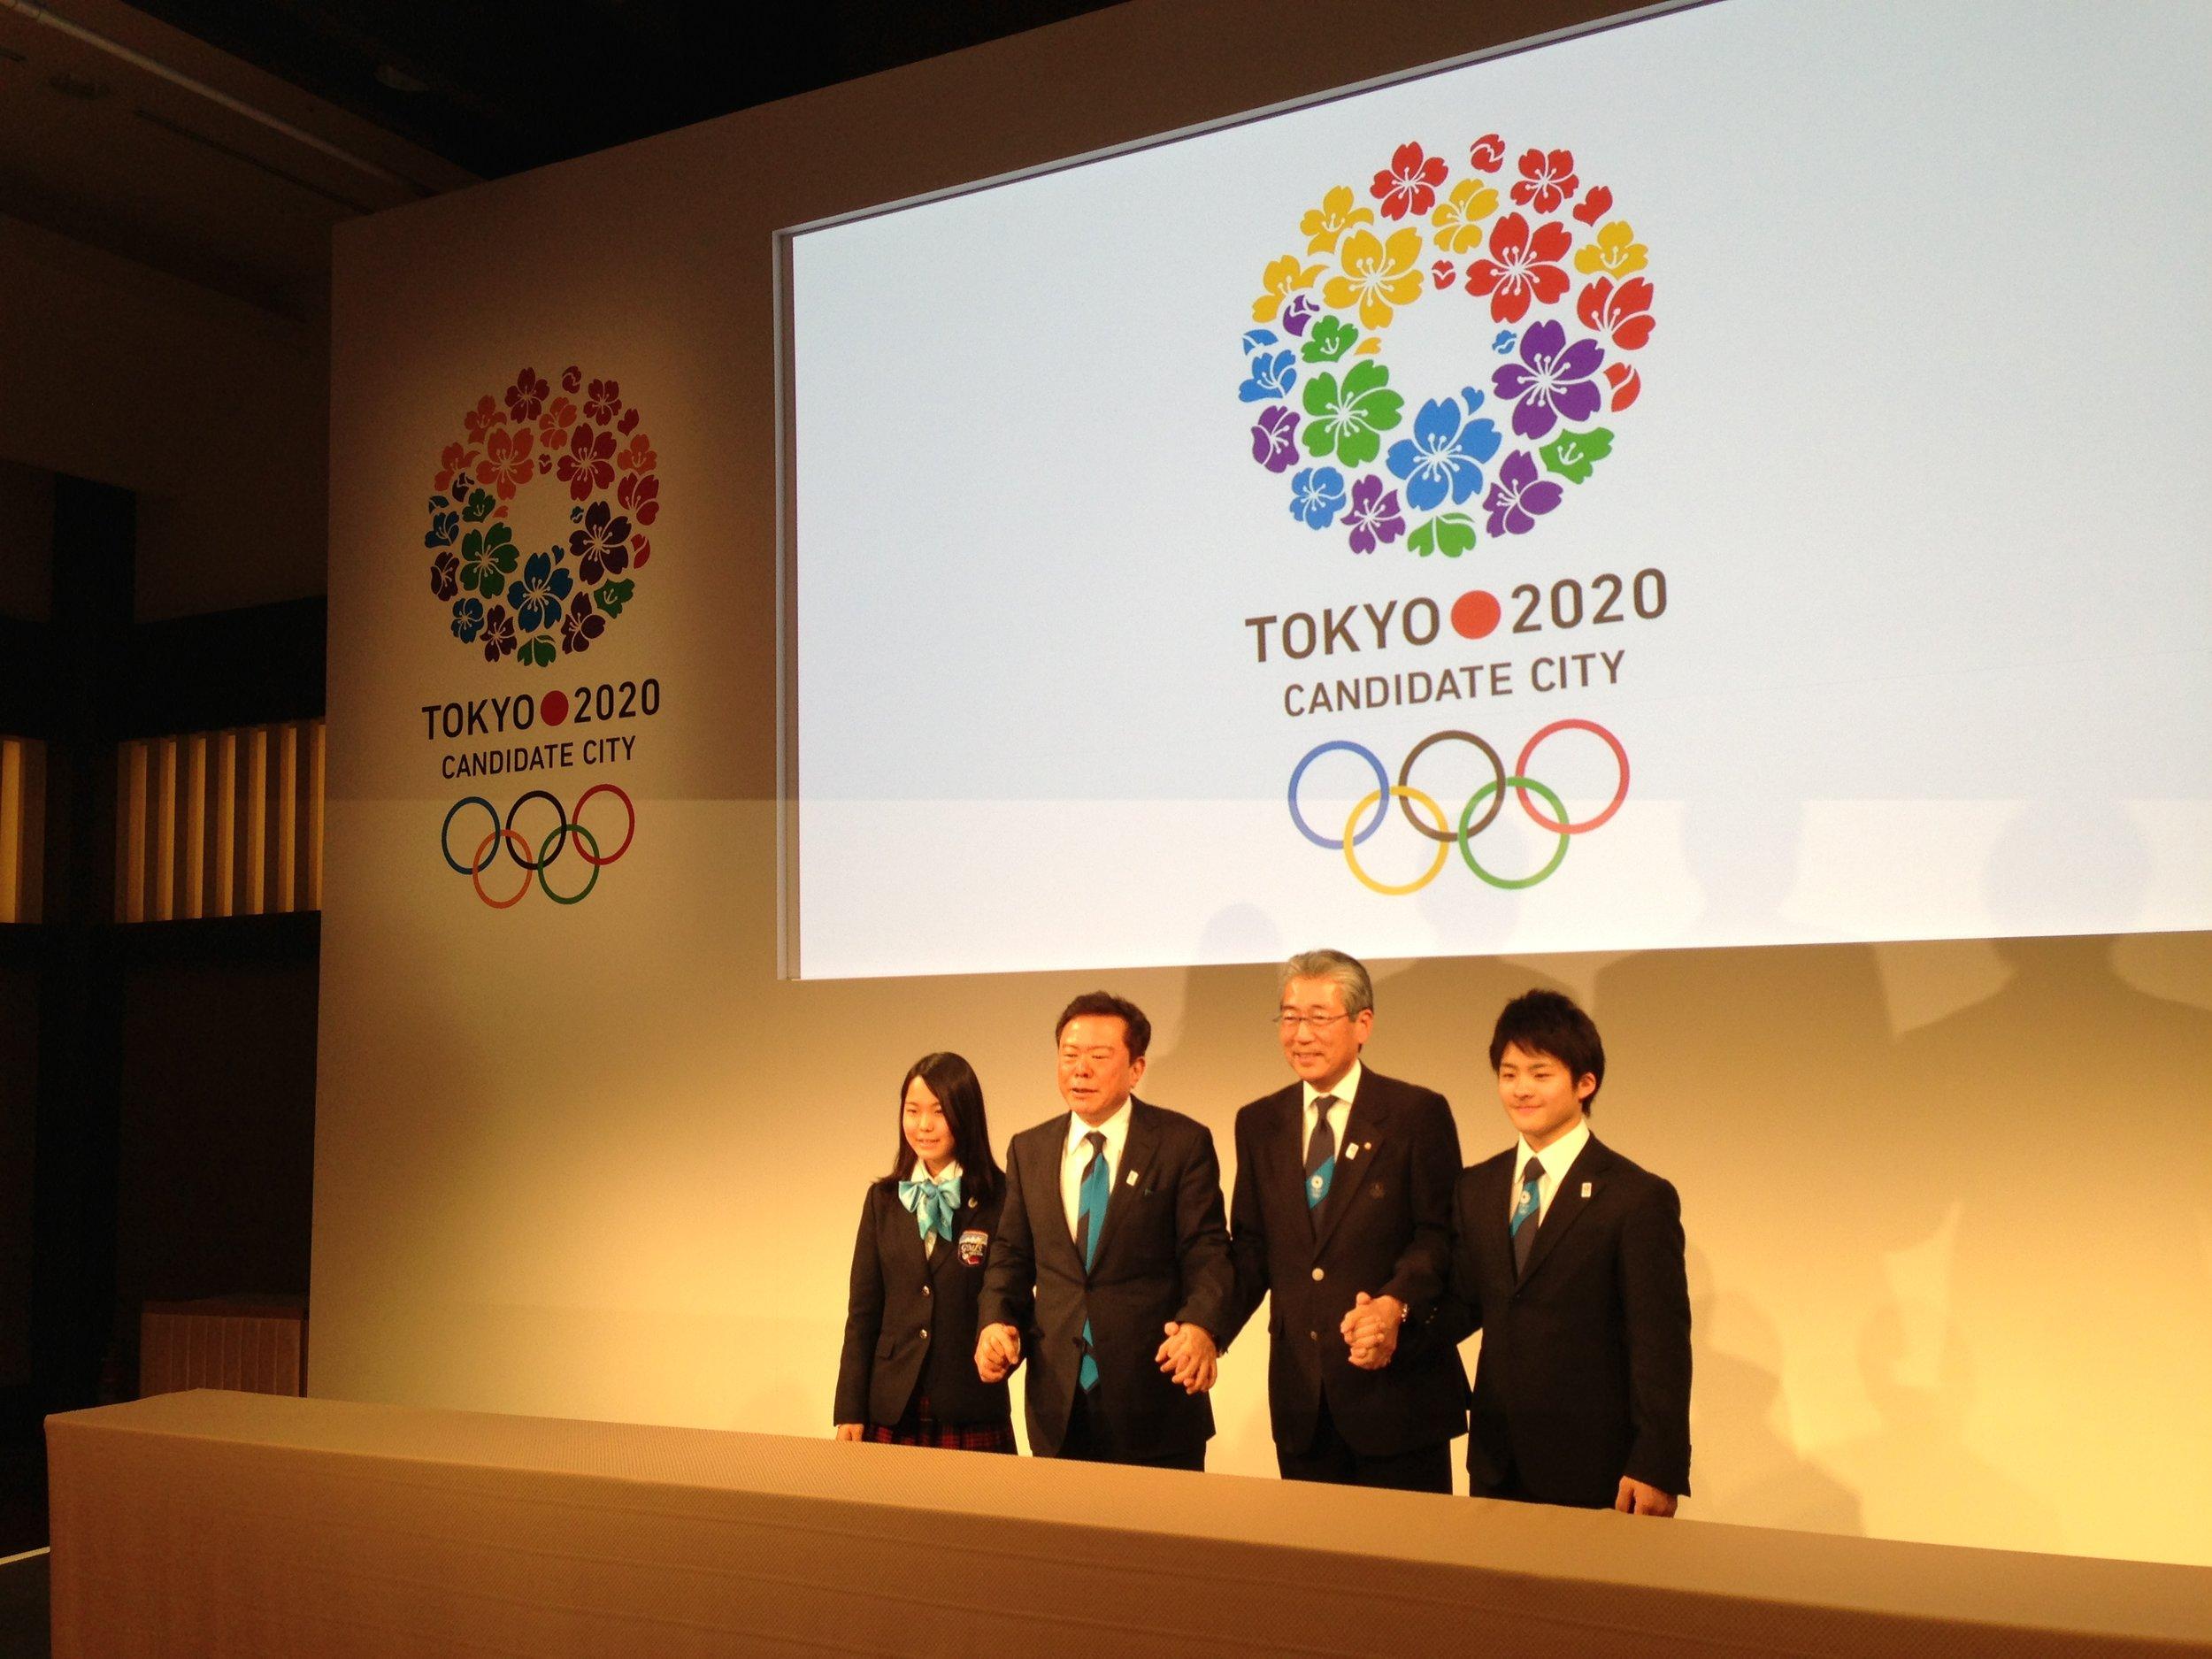 Left to right: ski jump champ Sara Takanashi, Tokyo Gov. Naoki Inose, Tokyo 2020 bid president Tsunekazu Takeda, Singapore 2010 Youth Games gymnastics gold medalist Yuya Kamoto